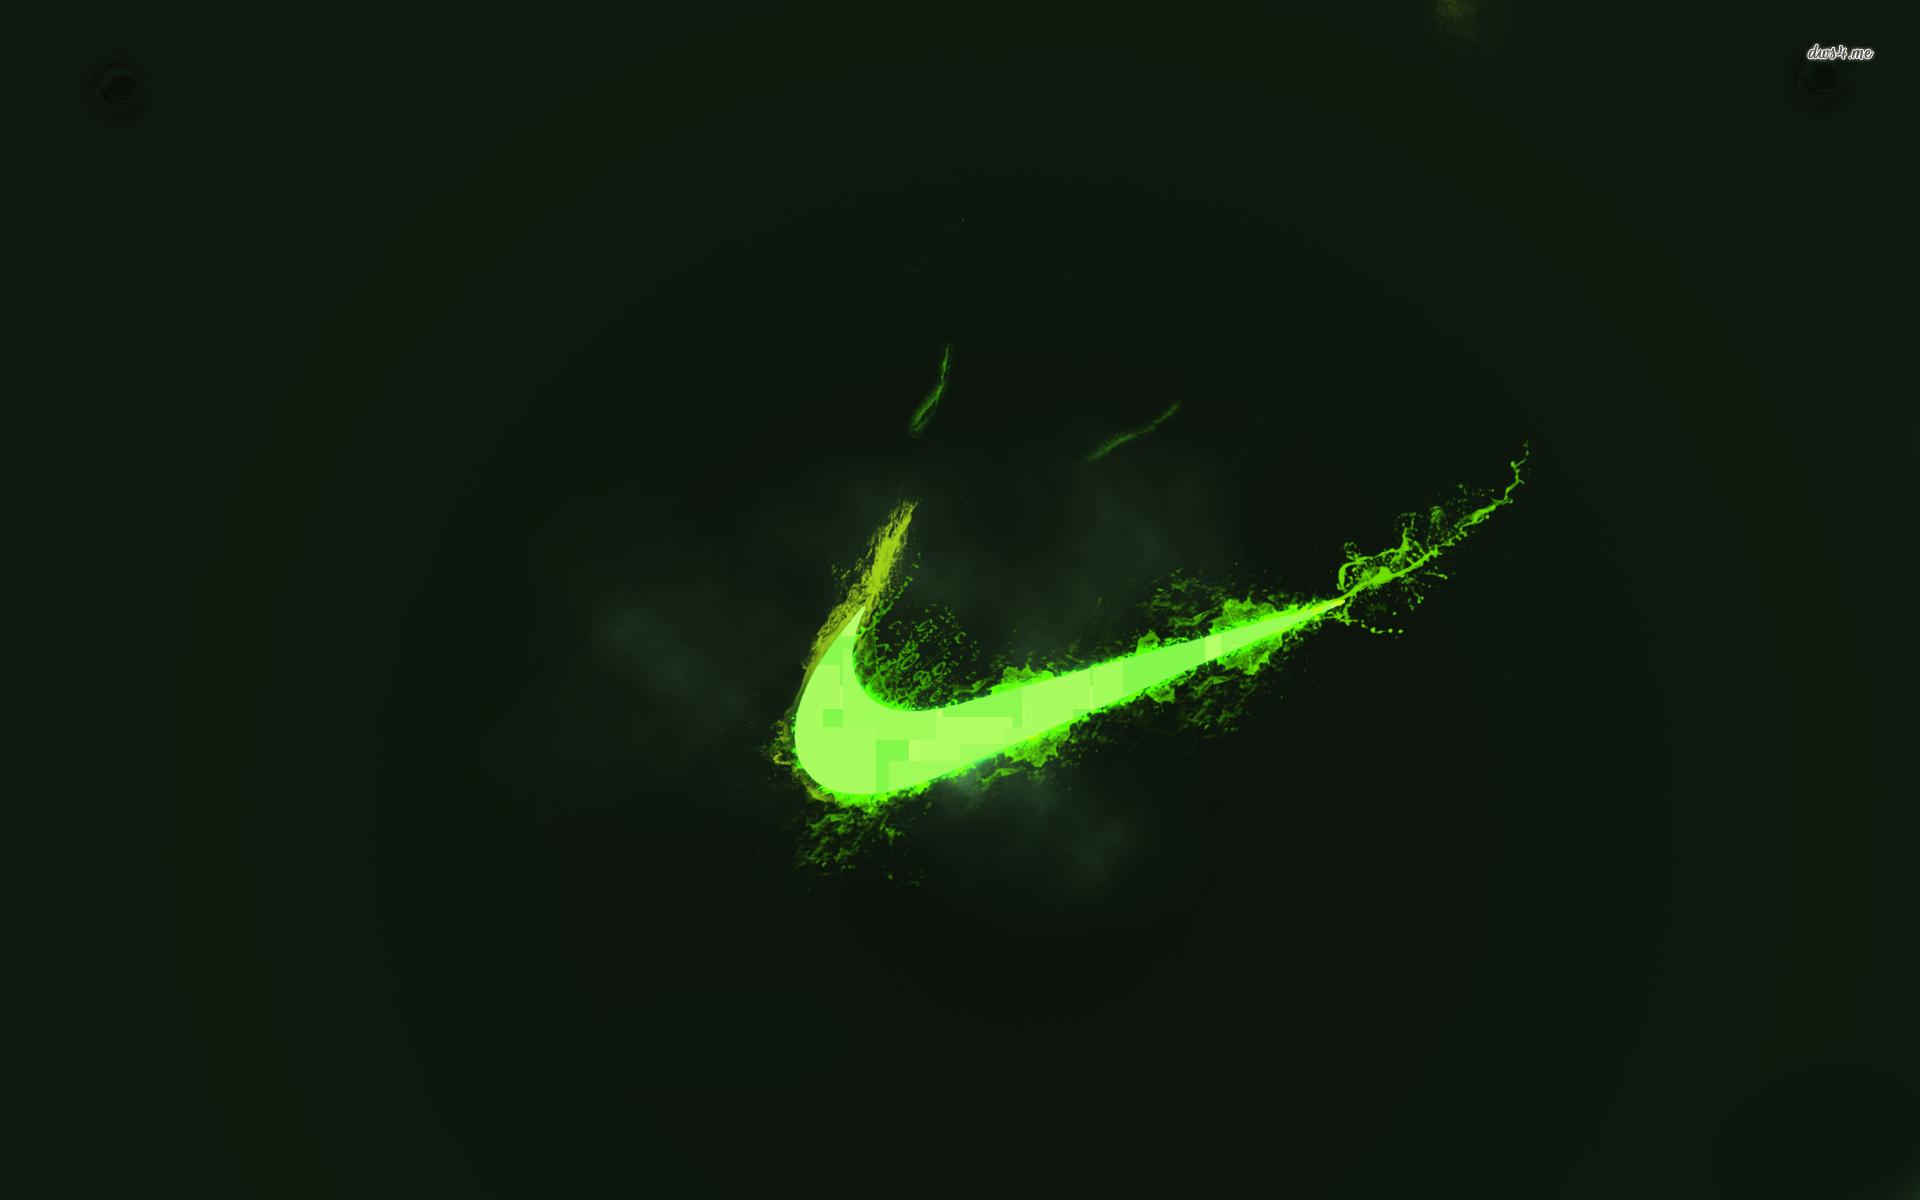 Neon Green Nike Logo Wallpaper Hd For Desktop cute Wallpapers 1920x1200